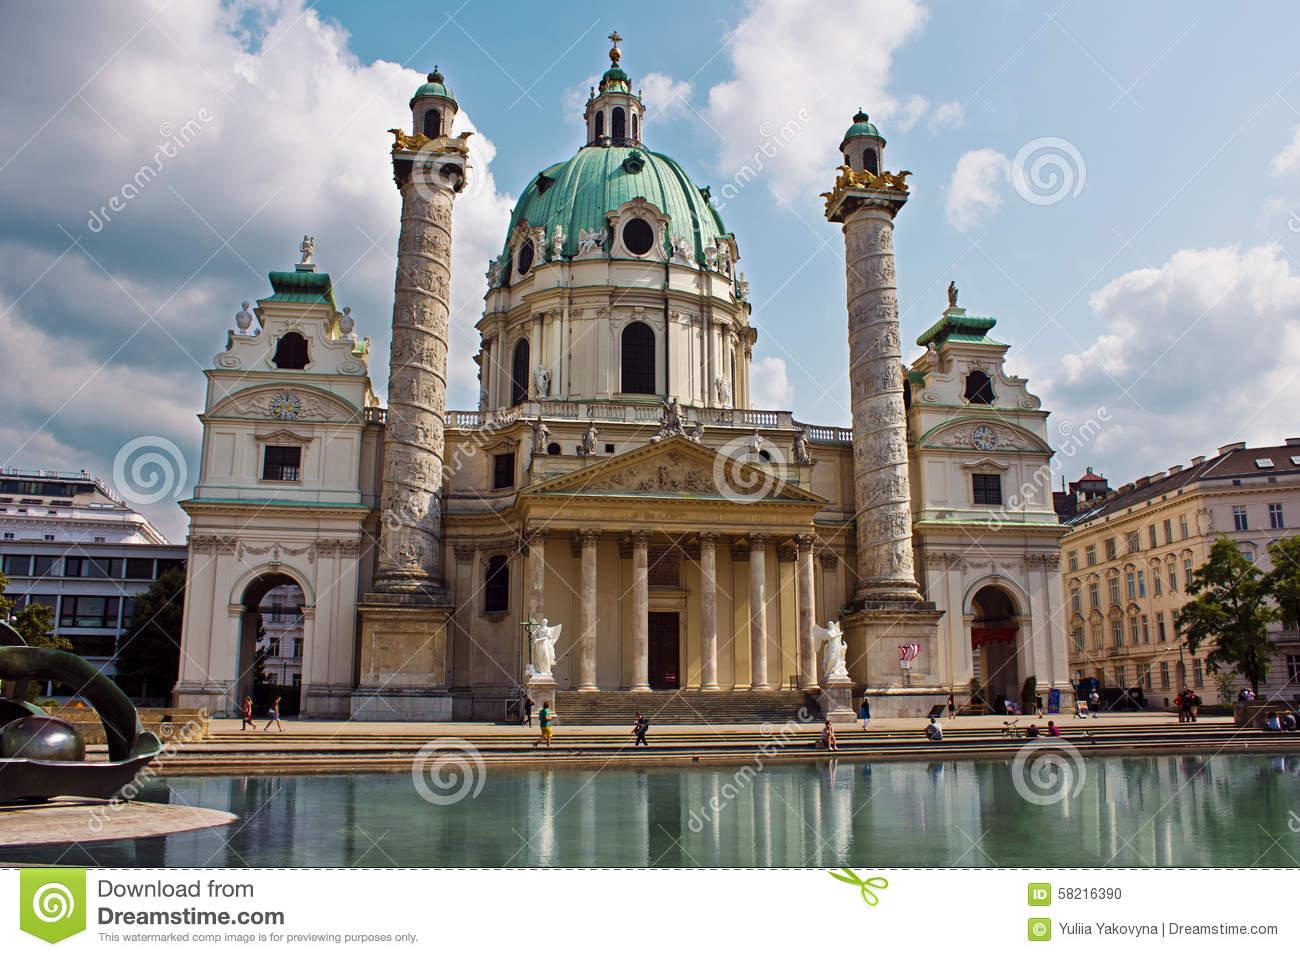 Church Of St. Charles Borromeo (Wiener Karlskirche) In Vienna.